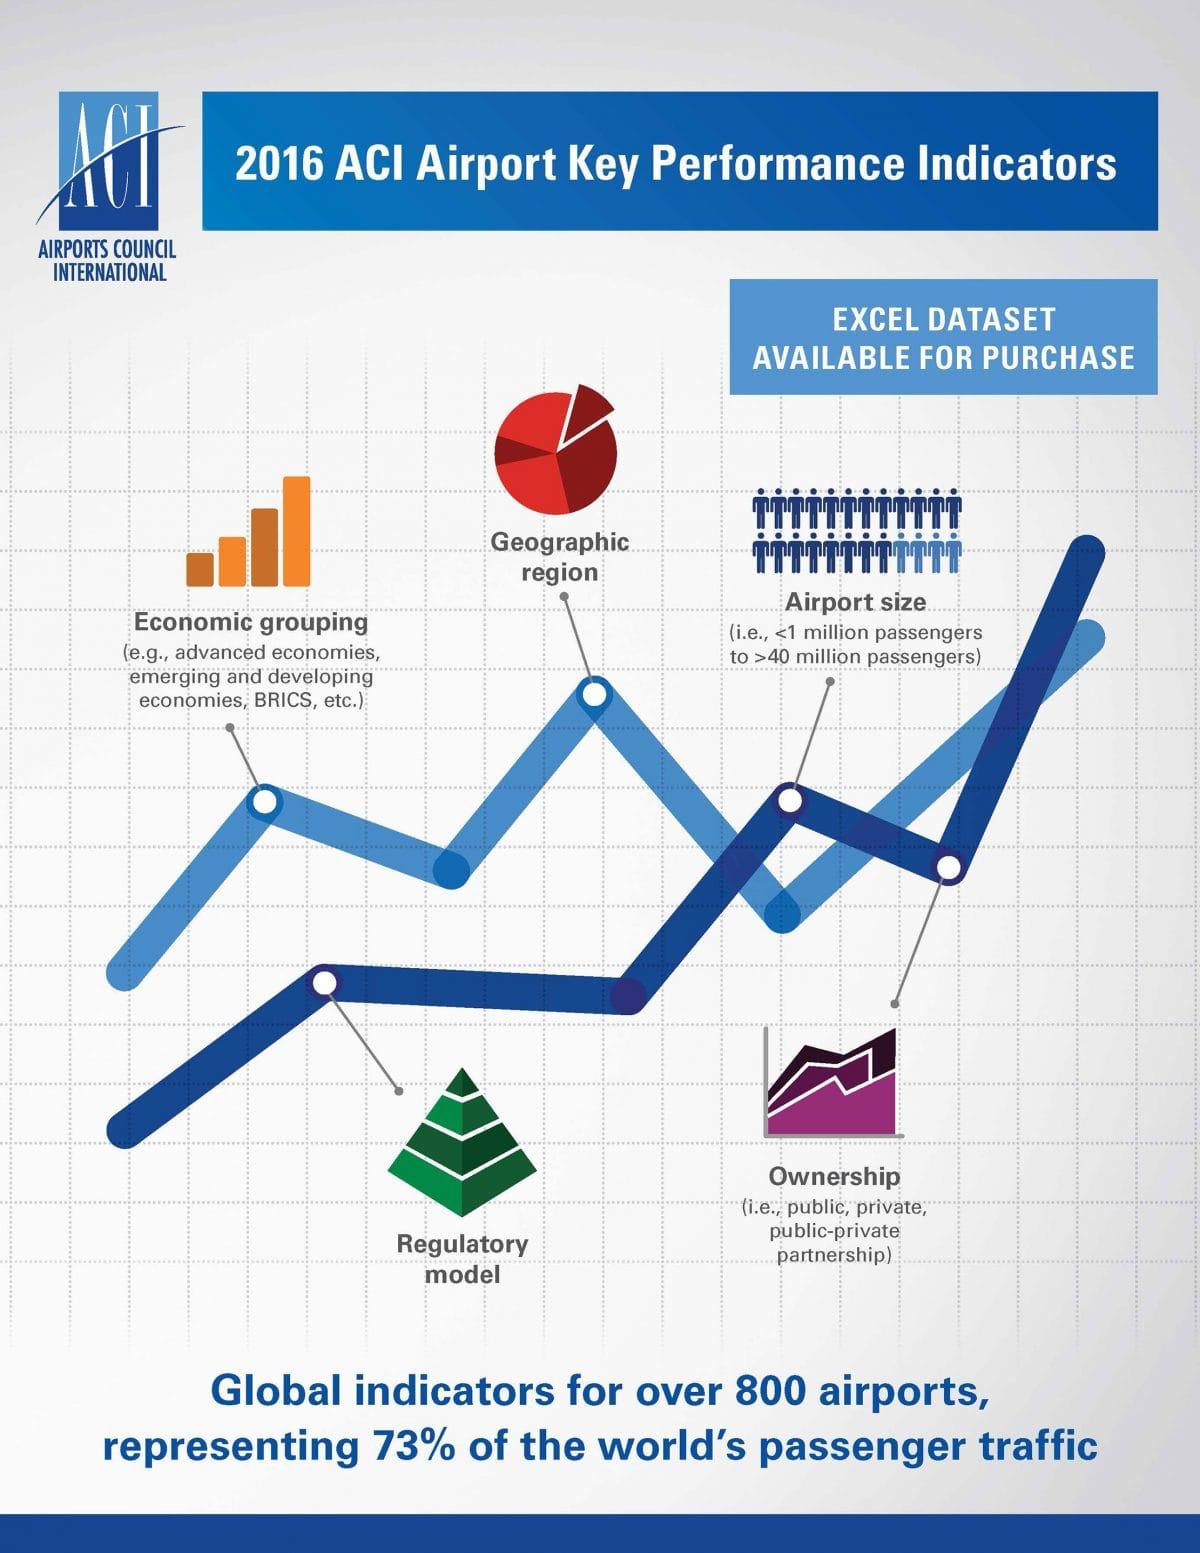 2016 ACI Airport Key Performance Indicators